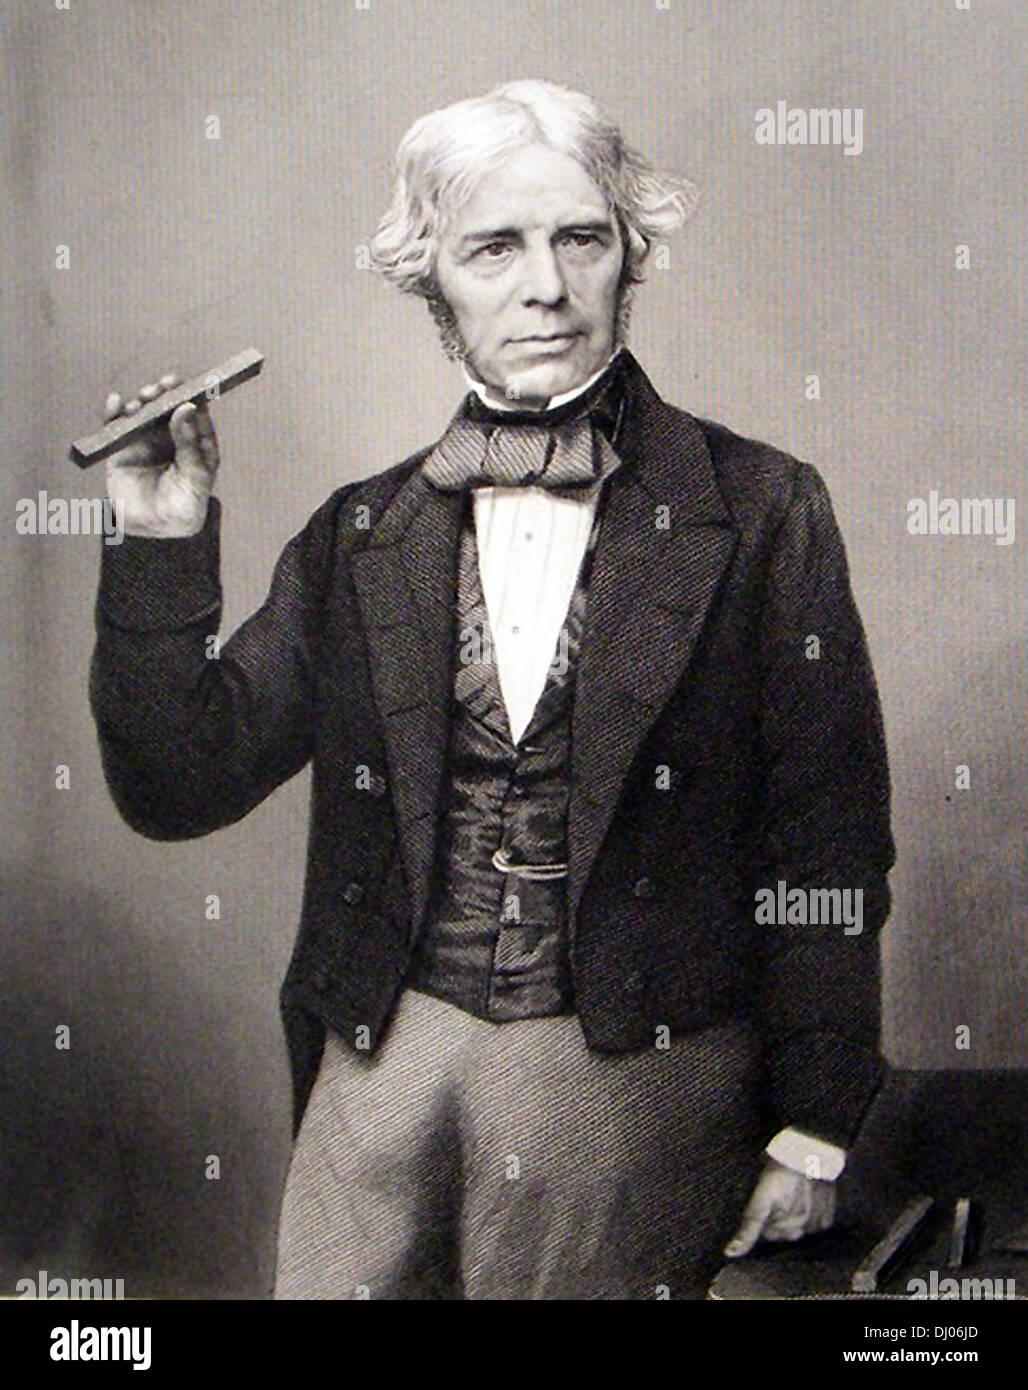 Michael Faraday, English scientist - Stock Image